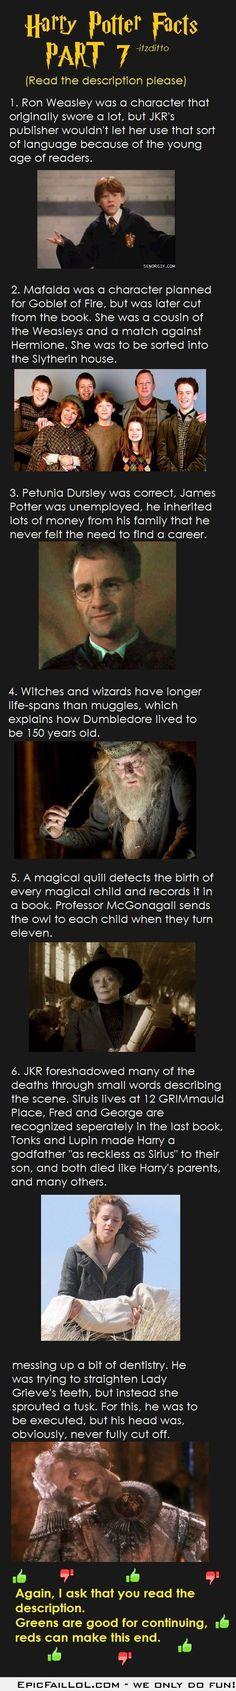 Harry Potter Facts Part 7